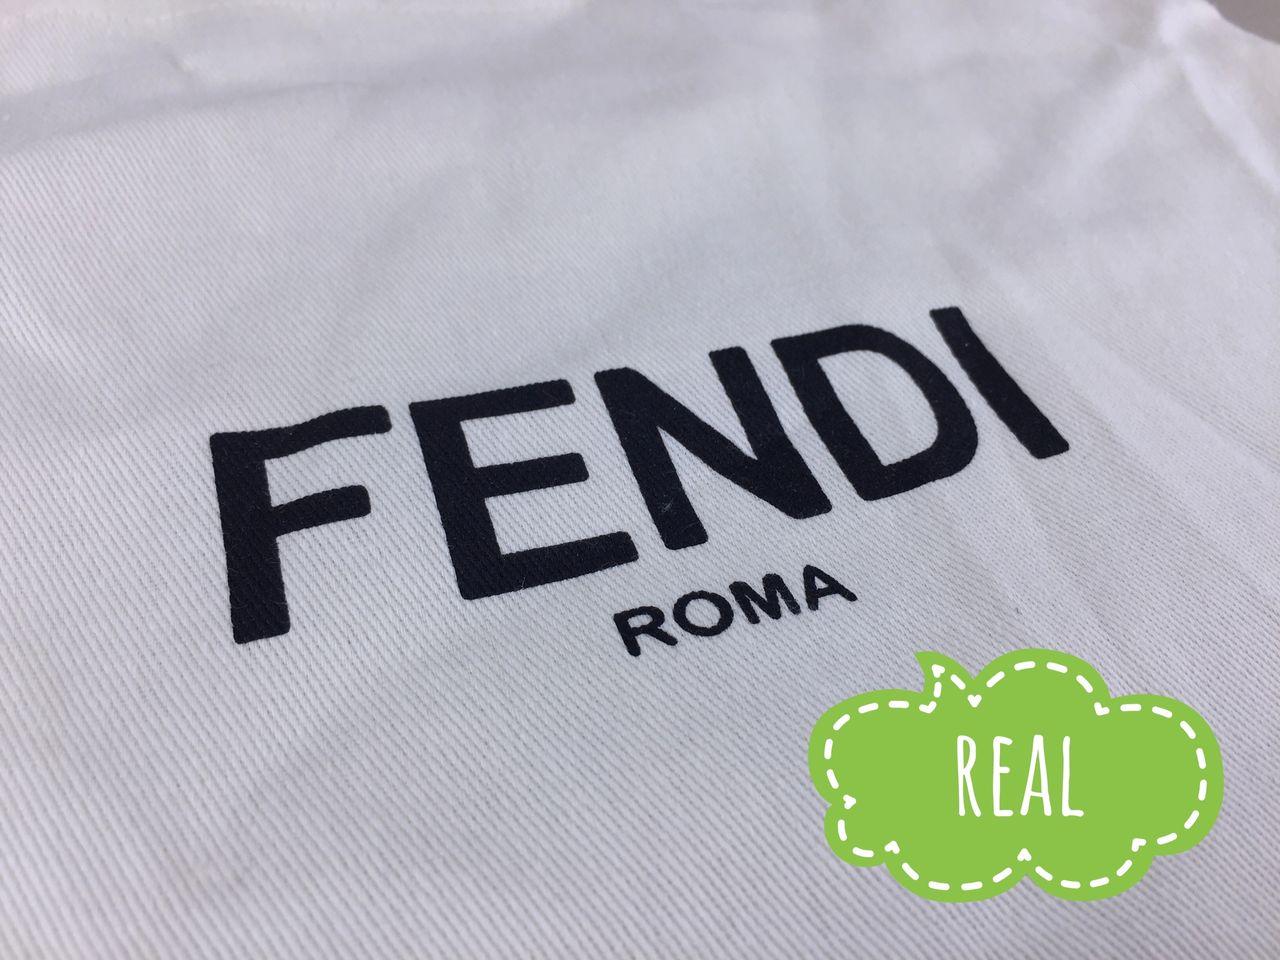 FENDI logo is printed on the dust bag